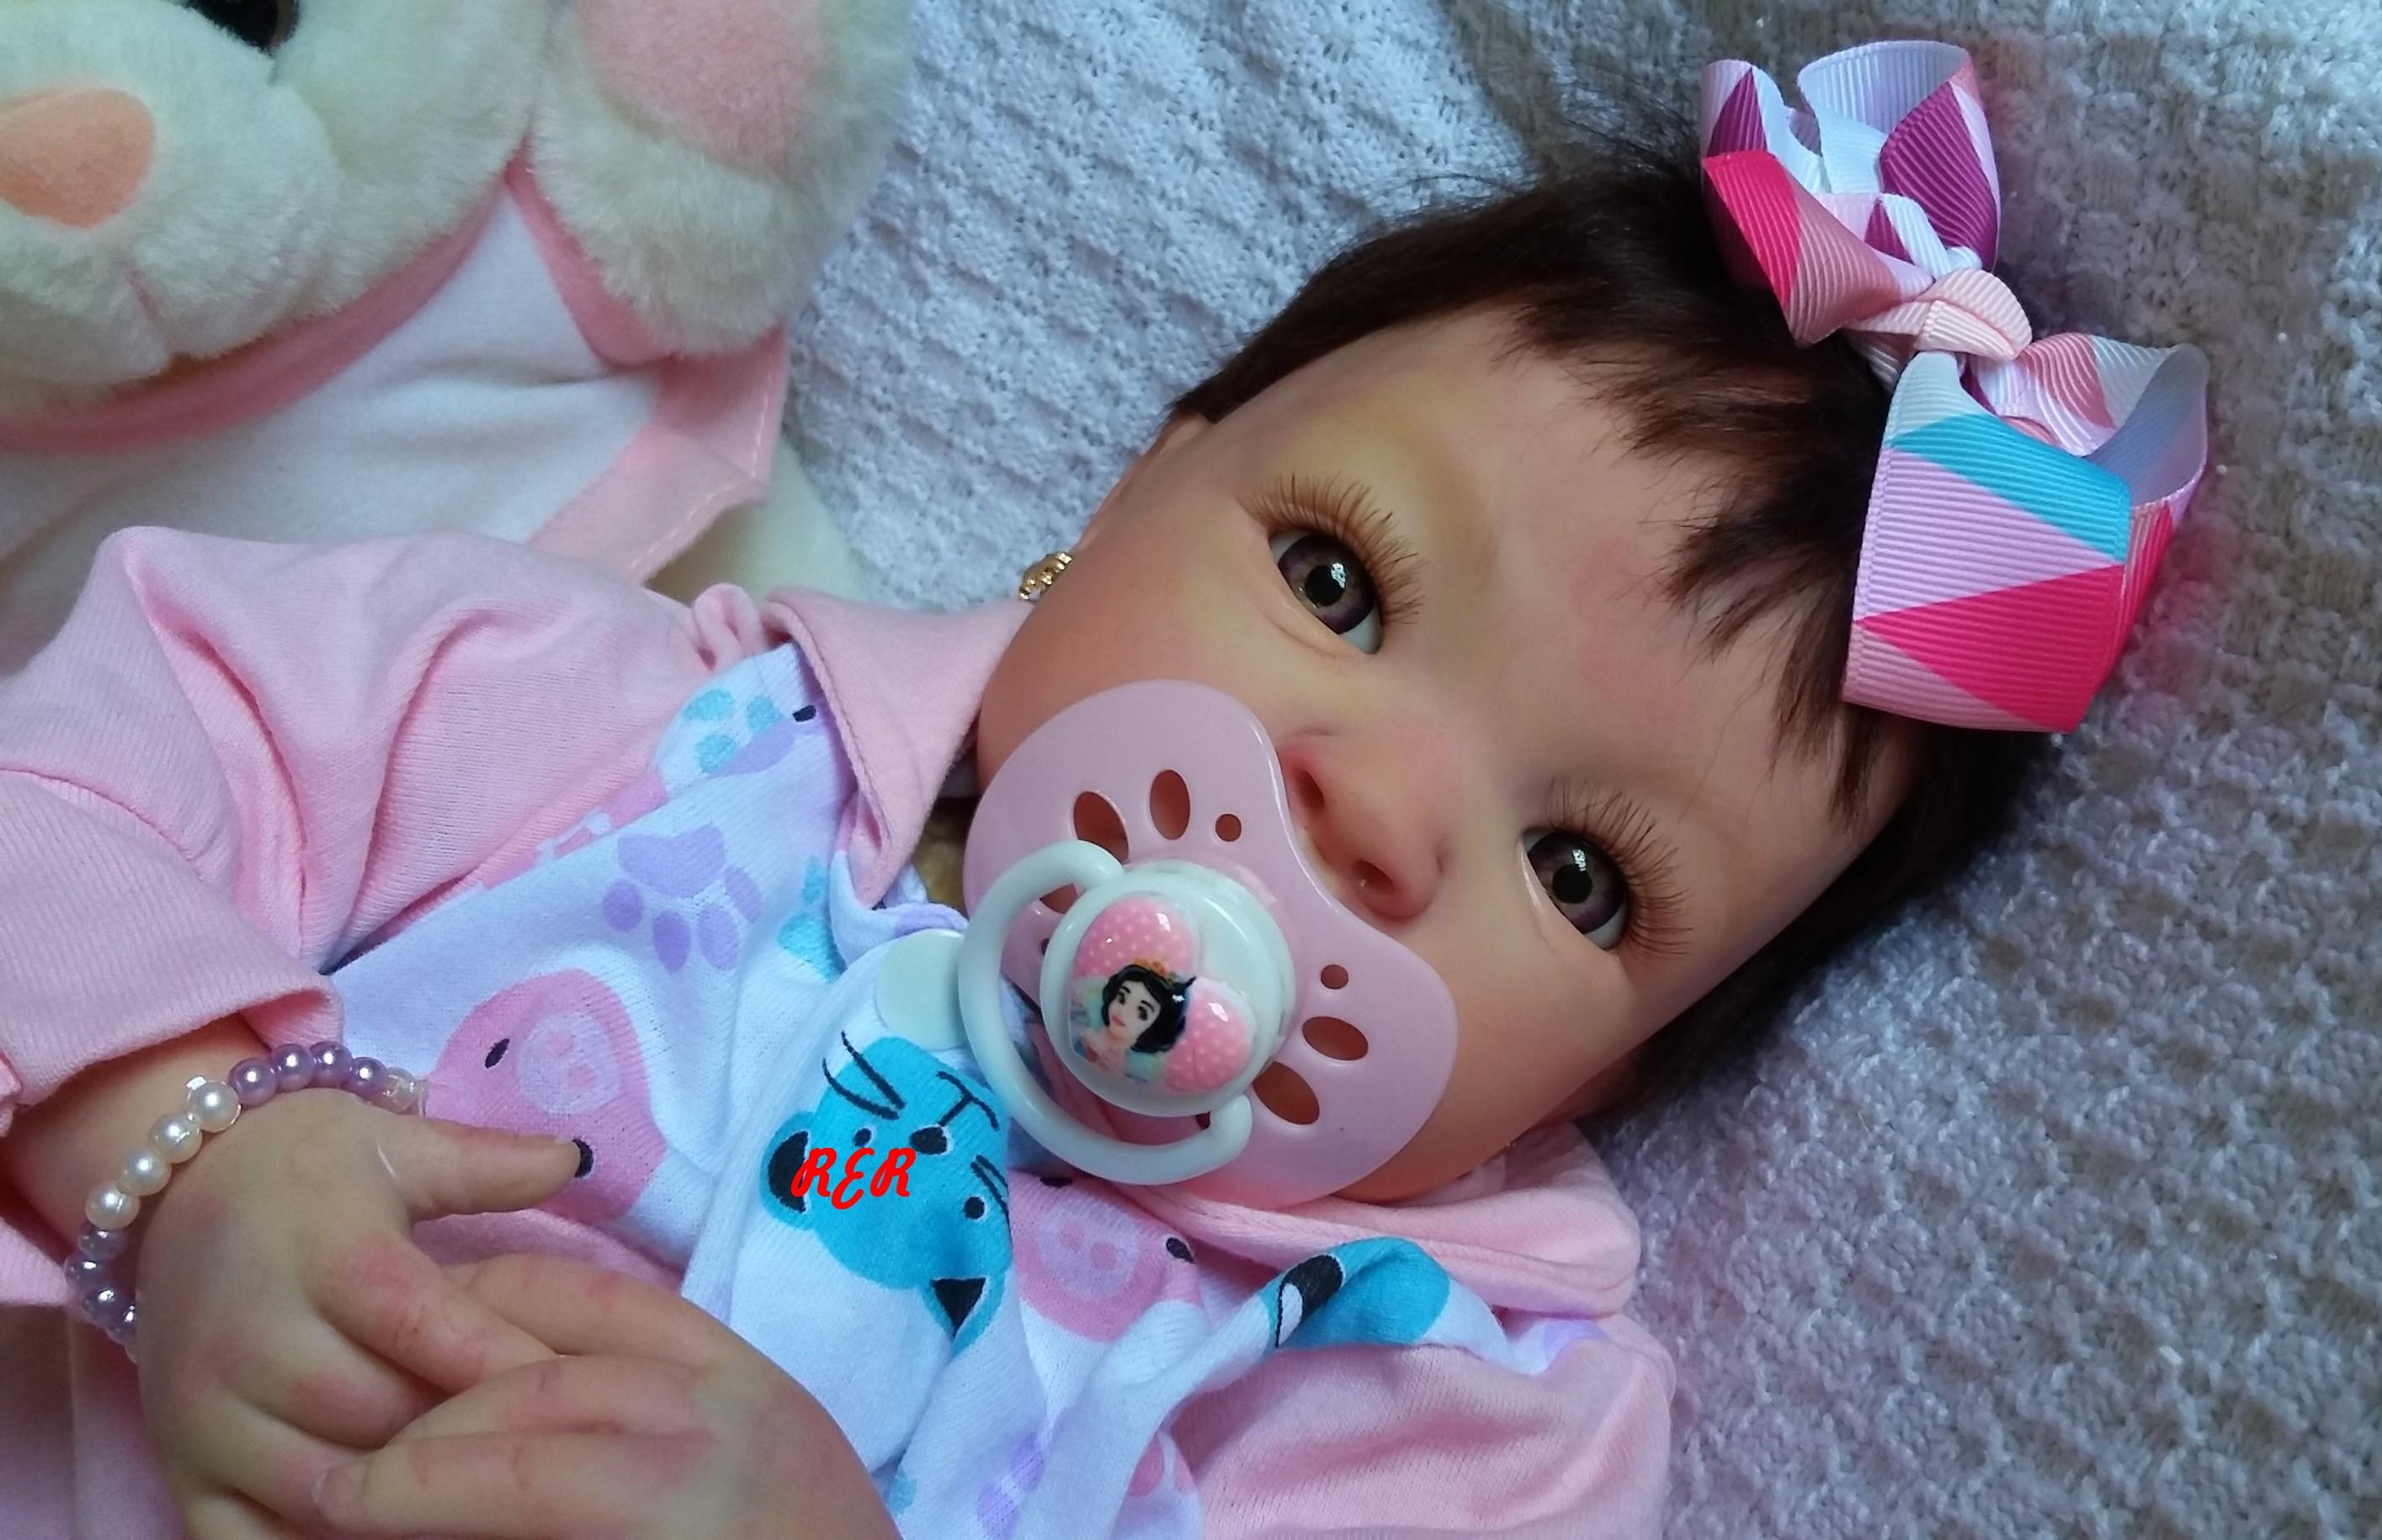 88182d7c0 Bebe Reborn Valentina 15 Dias Uteis